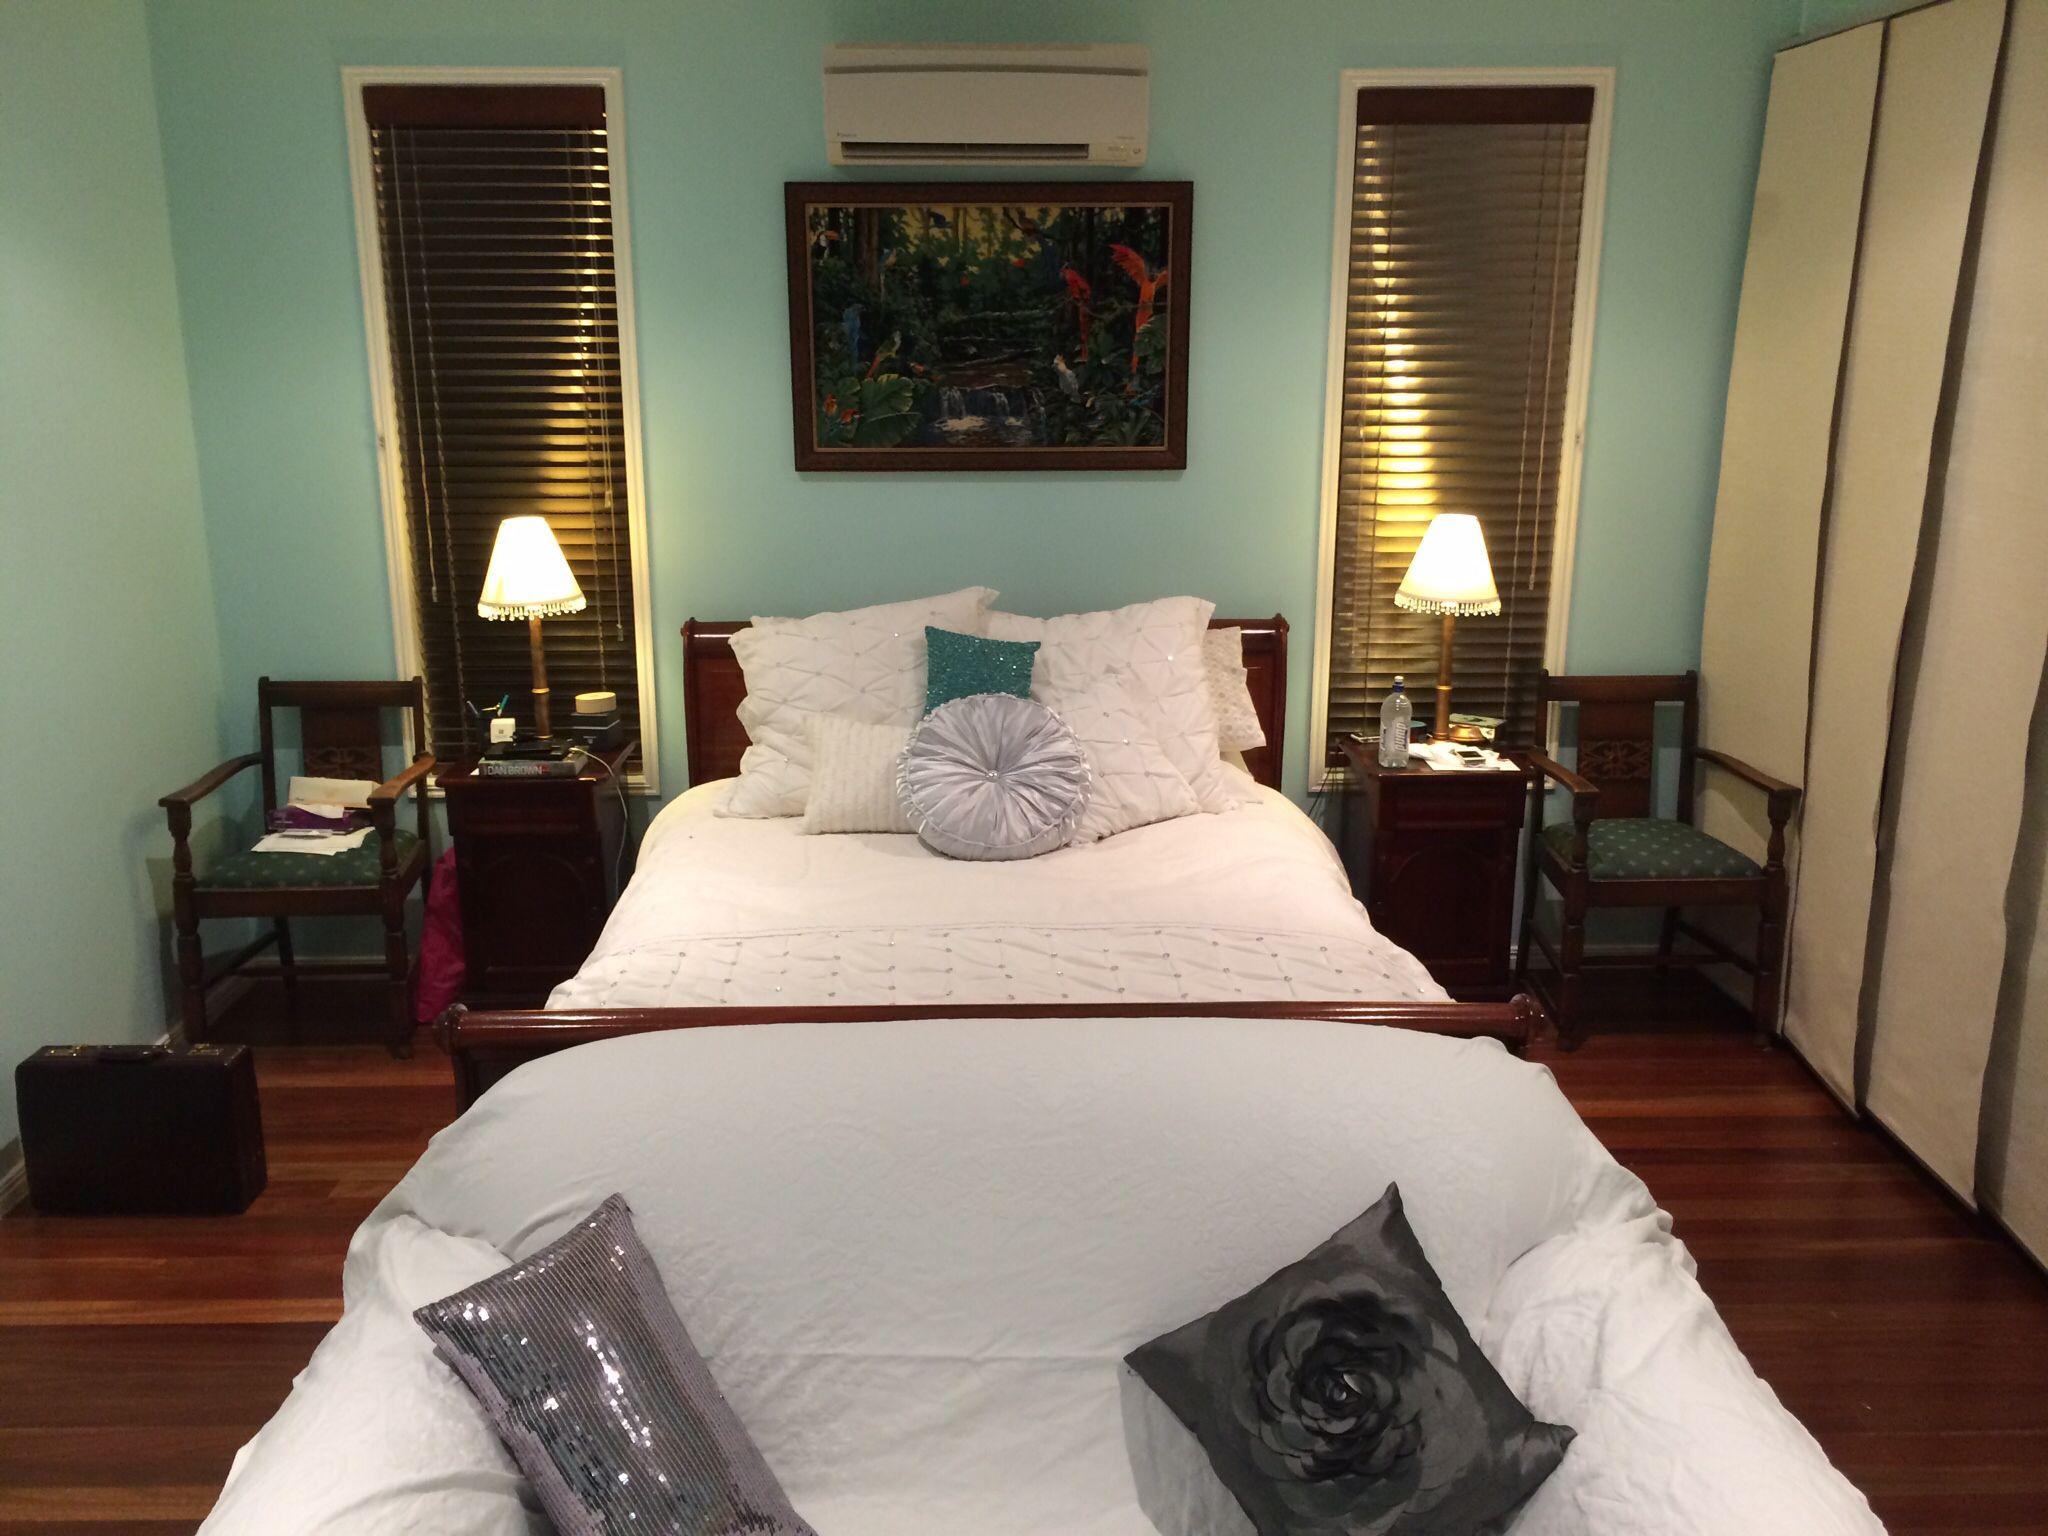 Tiffany blue bedroom Taubman's 'Sky Green' Blue